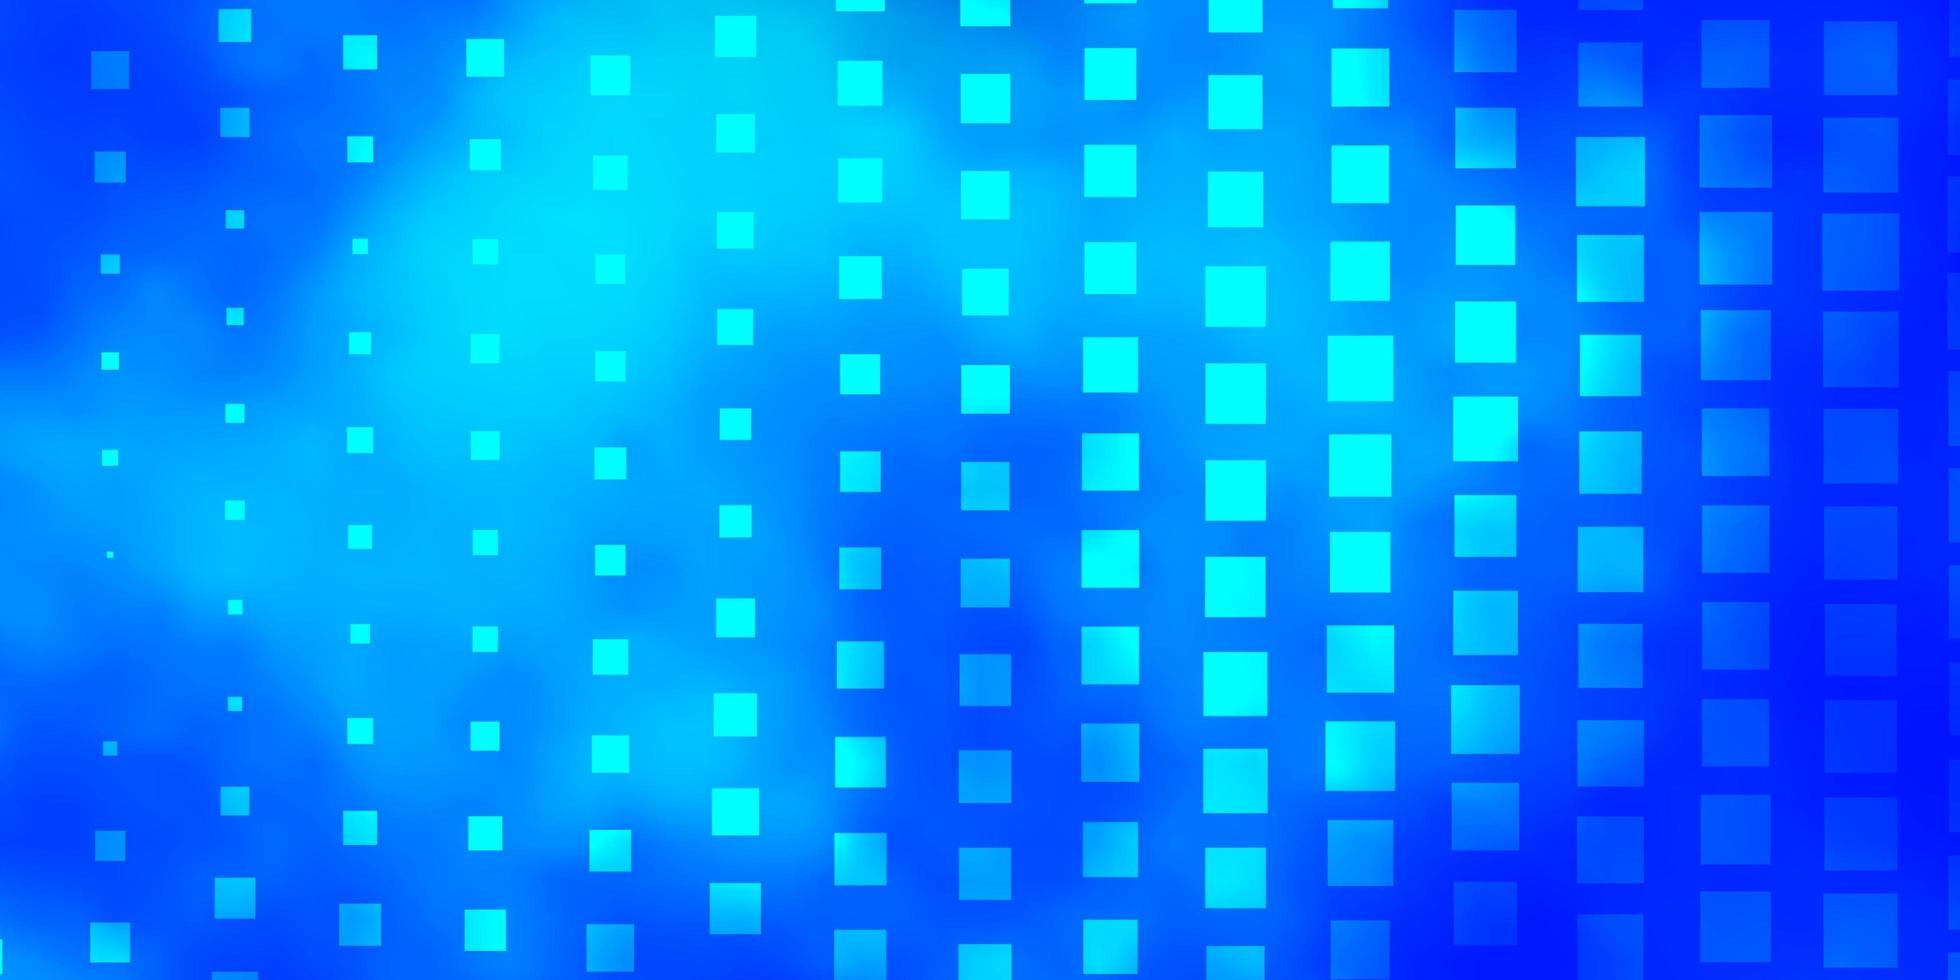 fond bleu avec des rectangles. vecteur